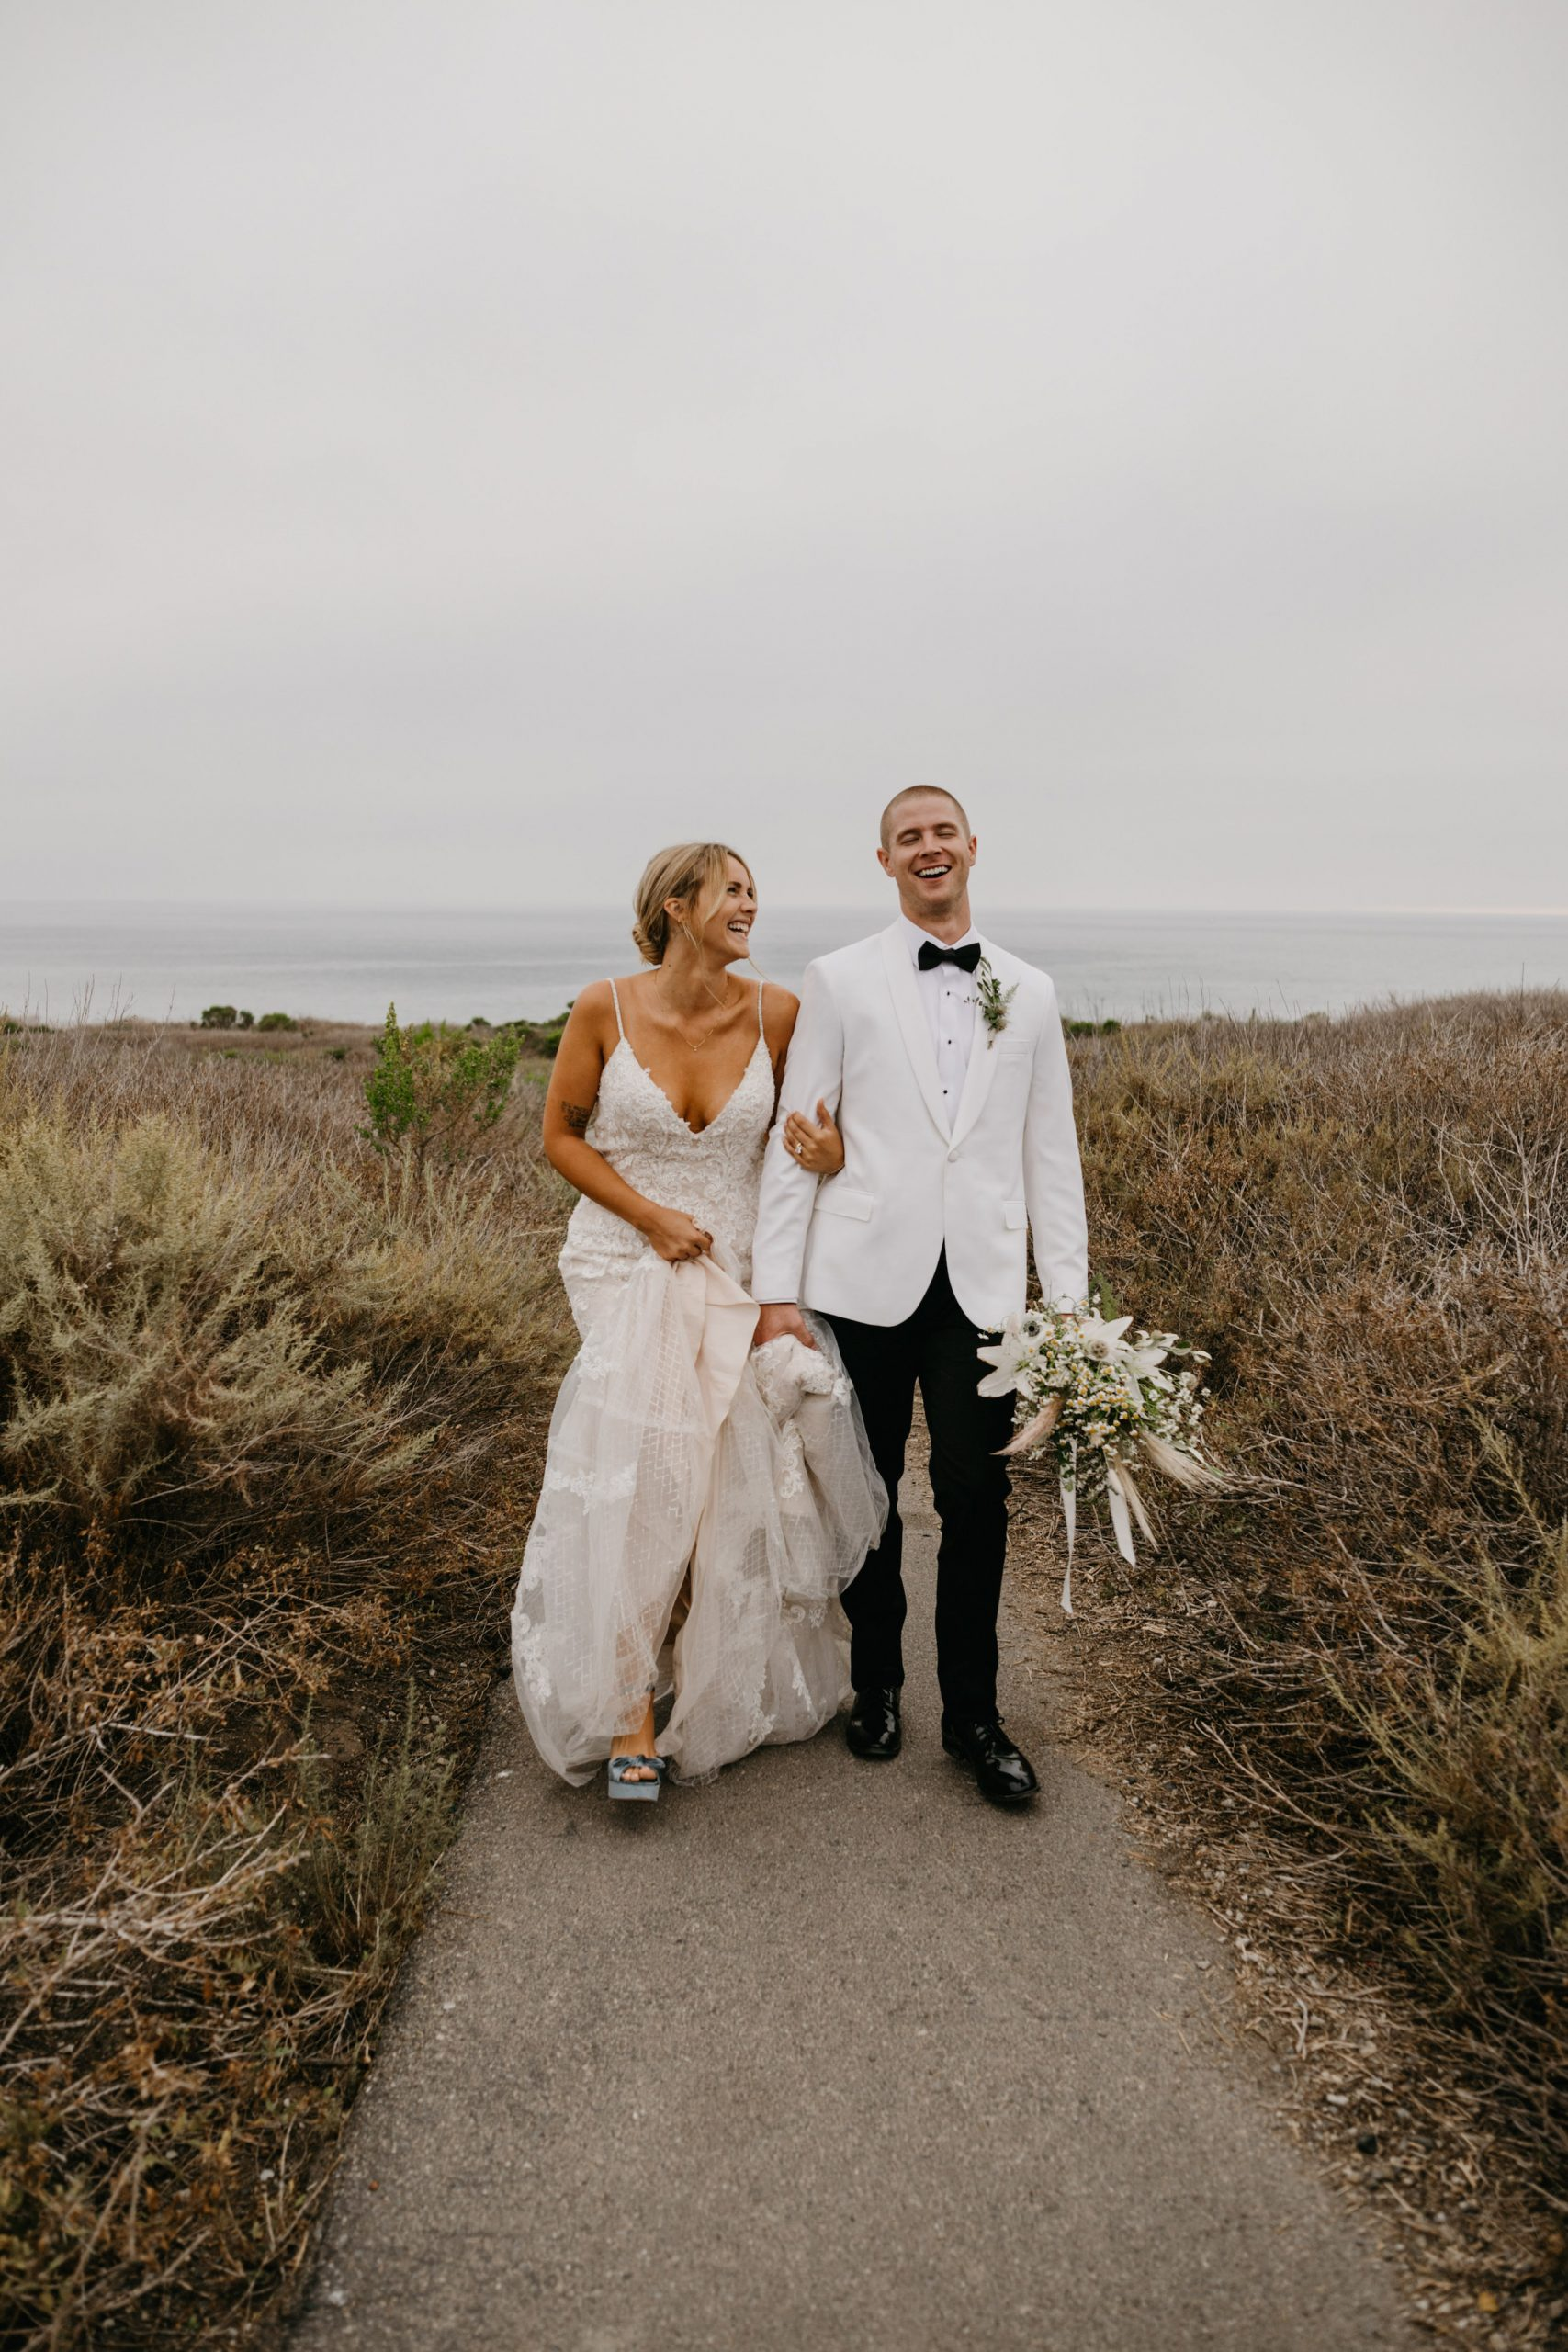 Bride and groom portrait in Crystal Cove State Park Wedding in Laguna Beach, image by Fatima Elreda Photo